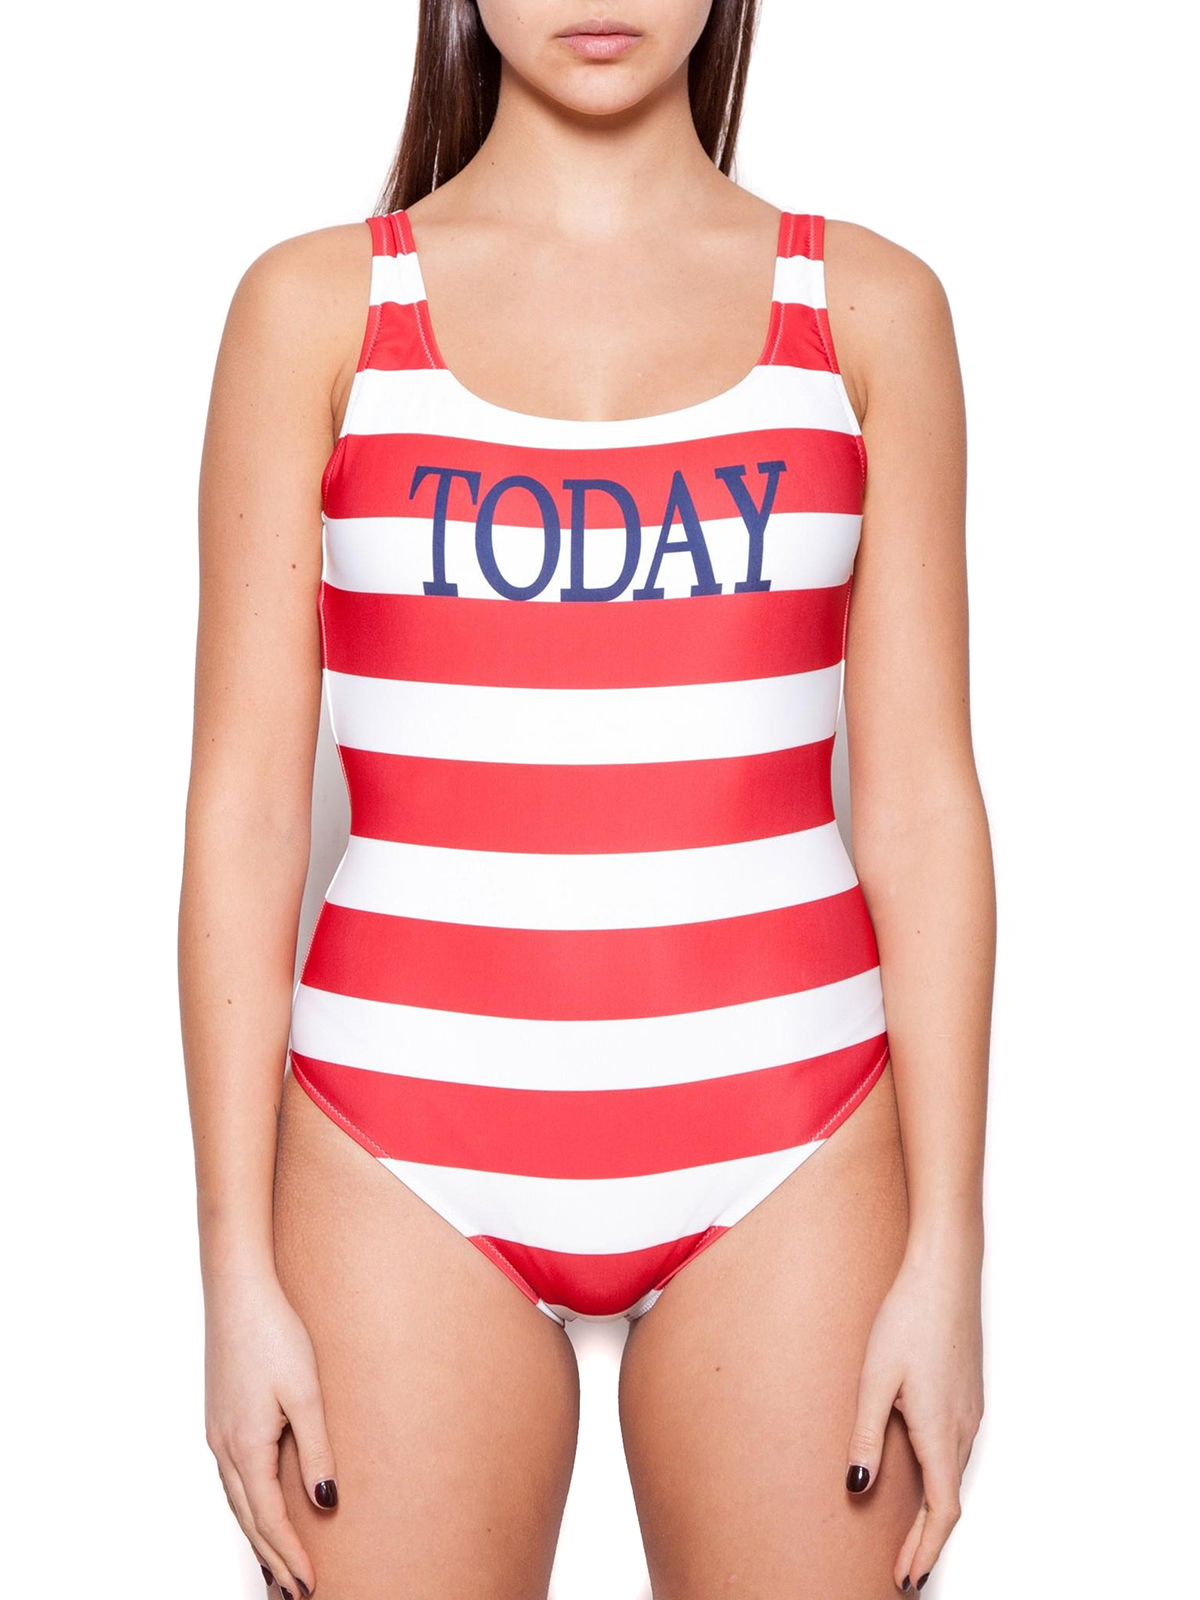 c7c43f687e iKRIX ALBERTA FERRETTI: one-piece - Rainbow Week Stripes Today swimsuit